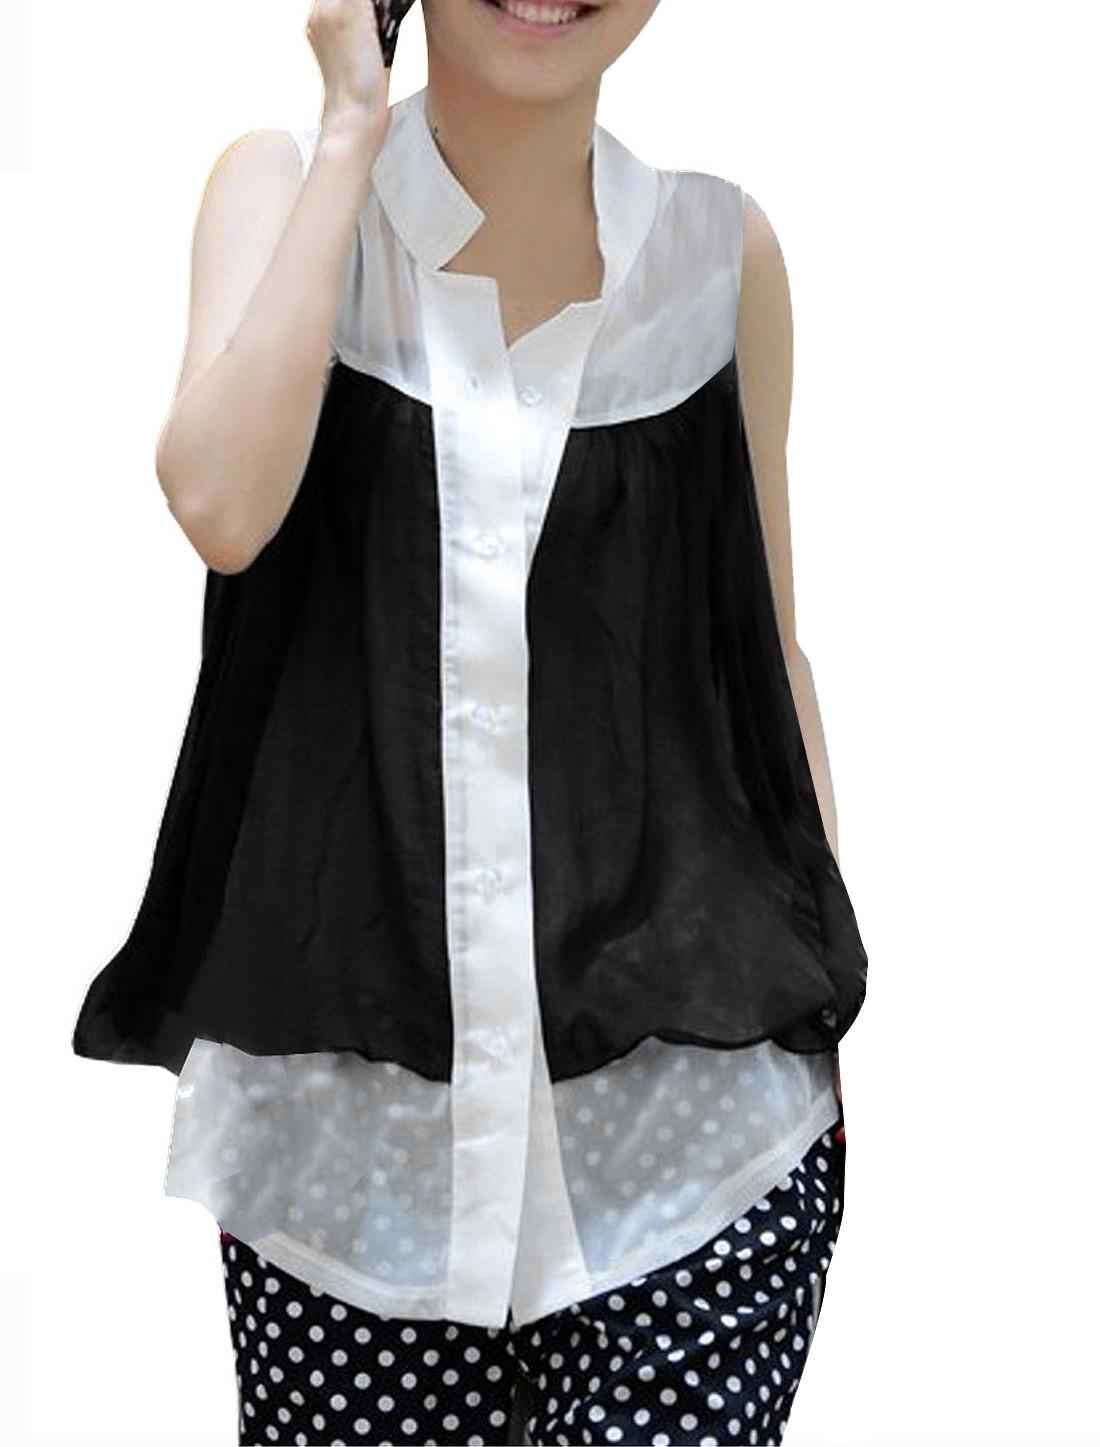 Fashion Sleeveless Black White Chiffon Vest Bluose Top XS for Women